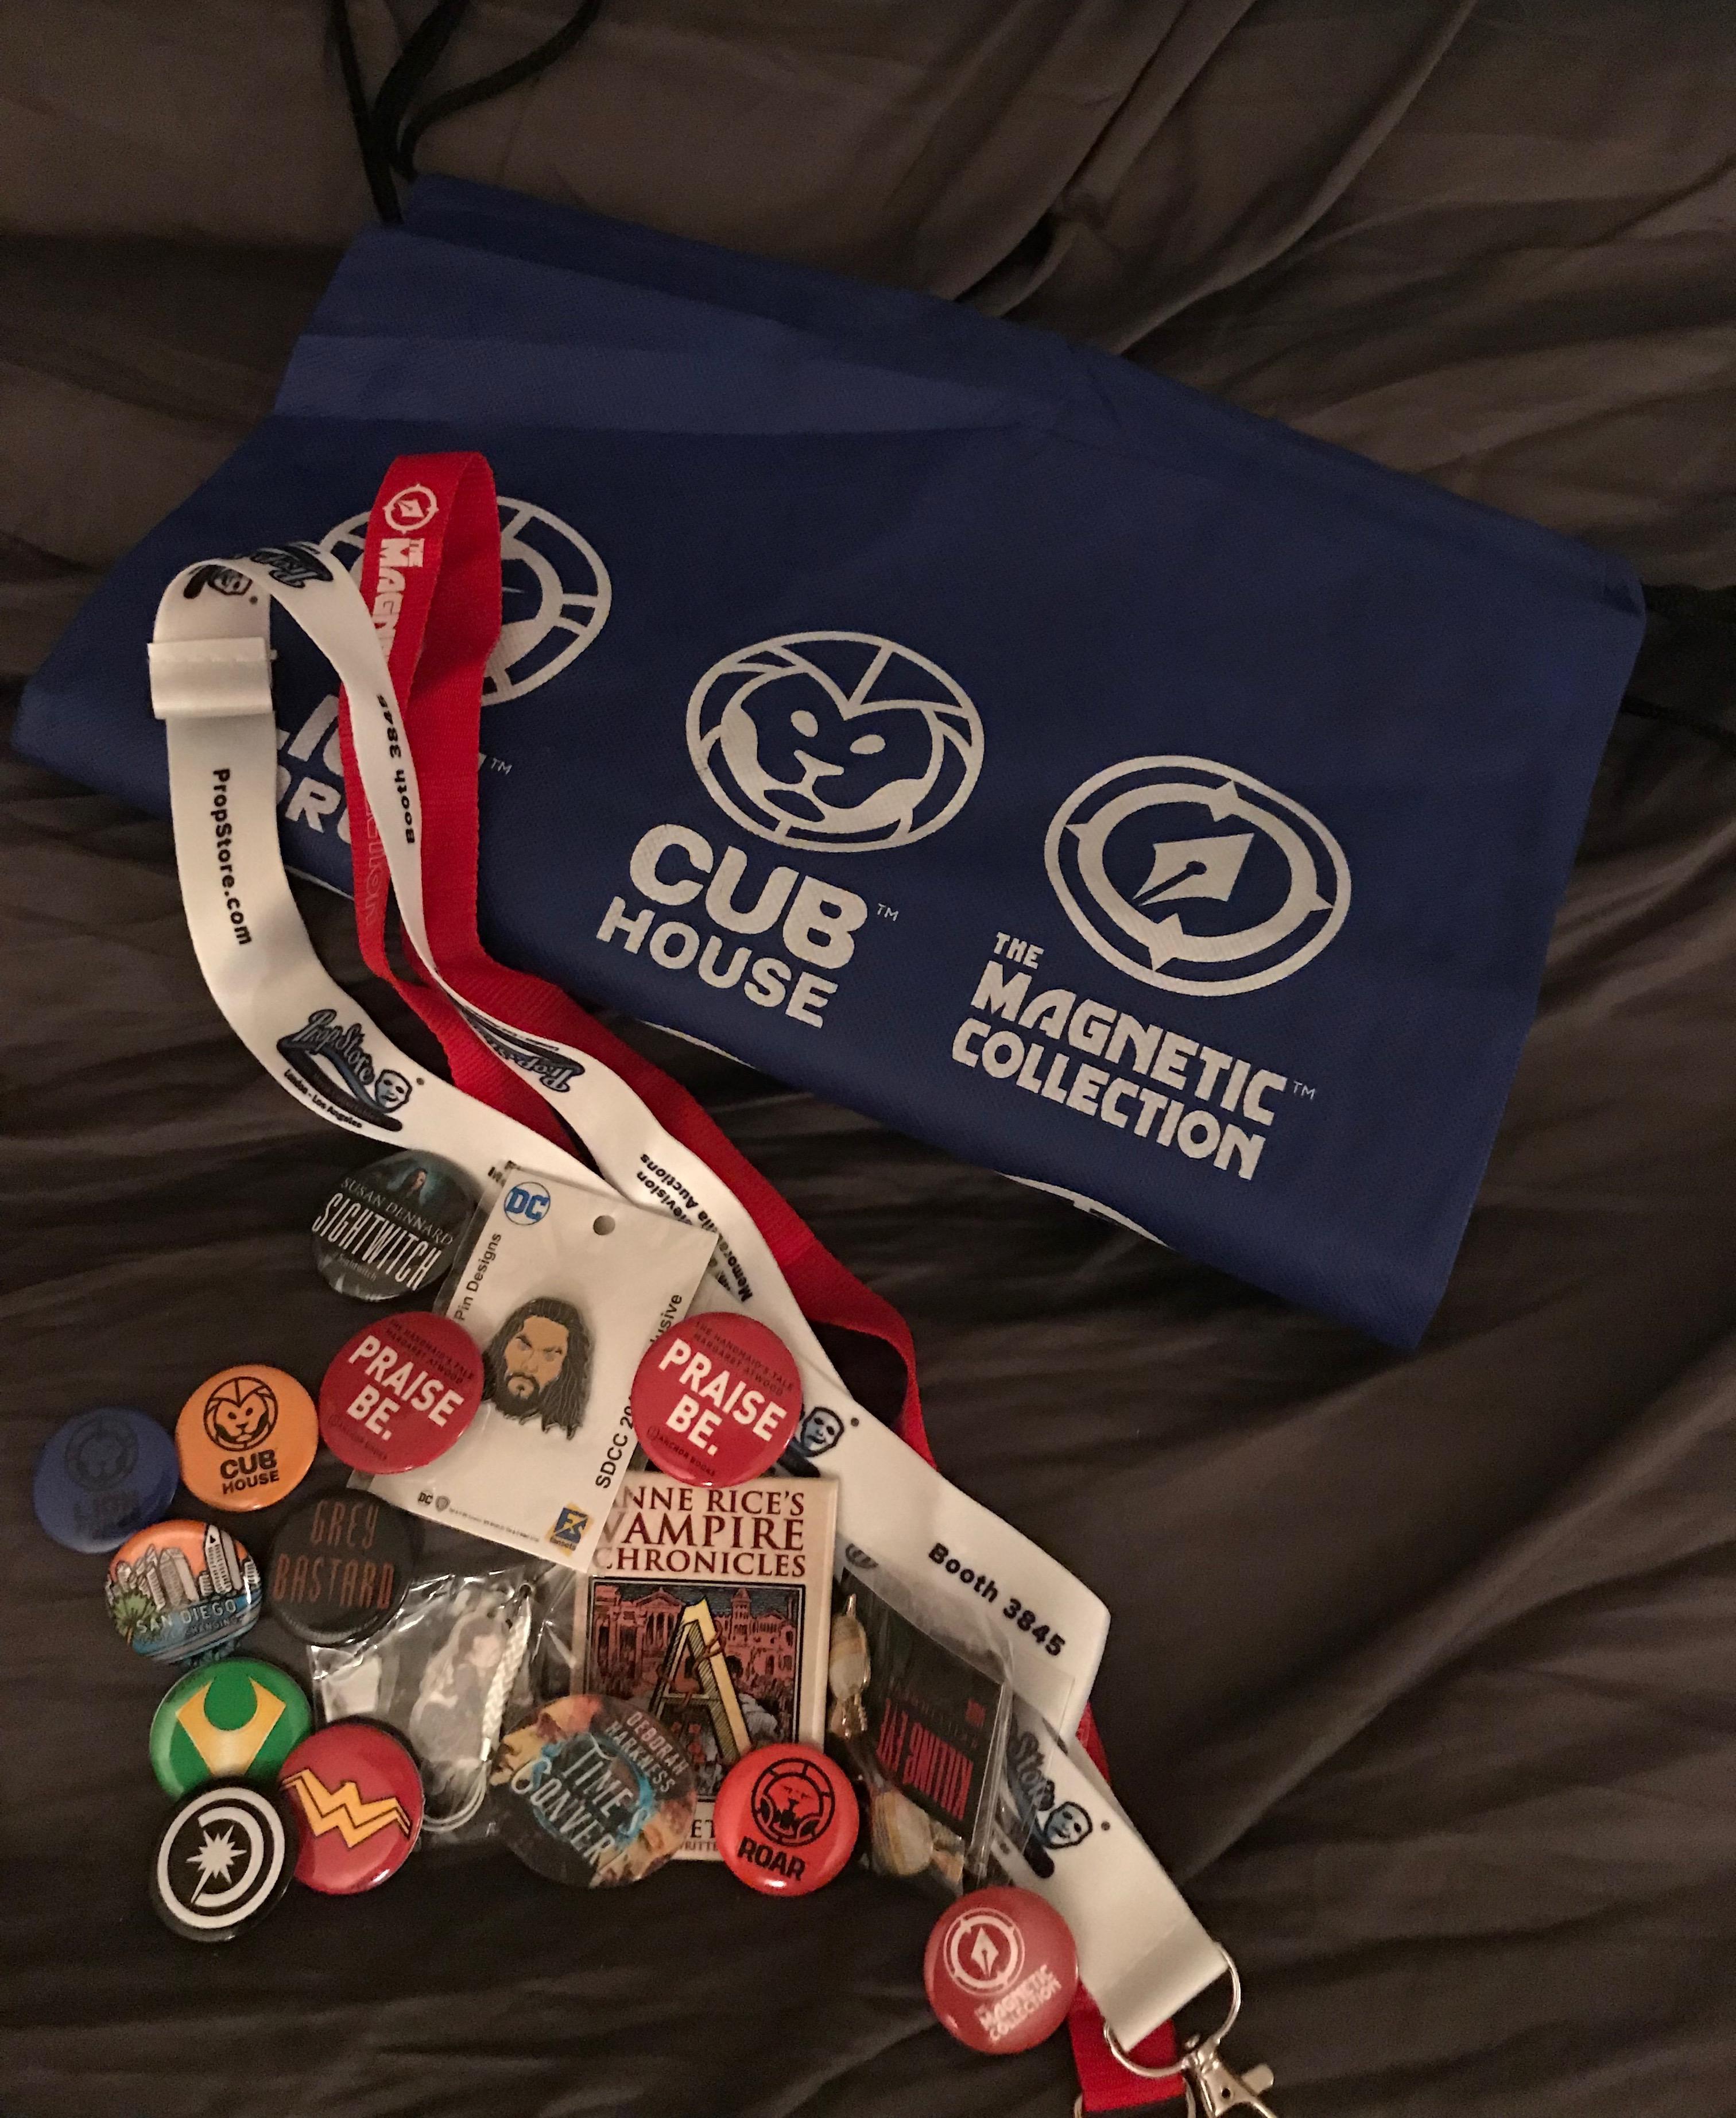 SDCC button packs